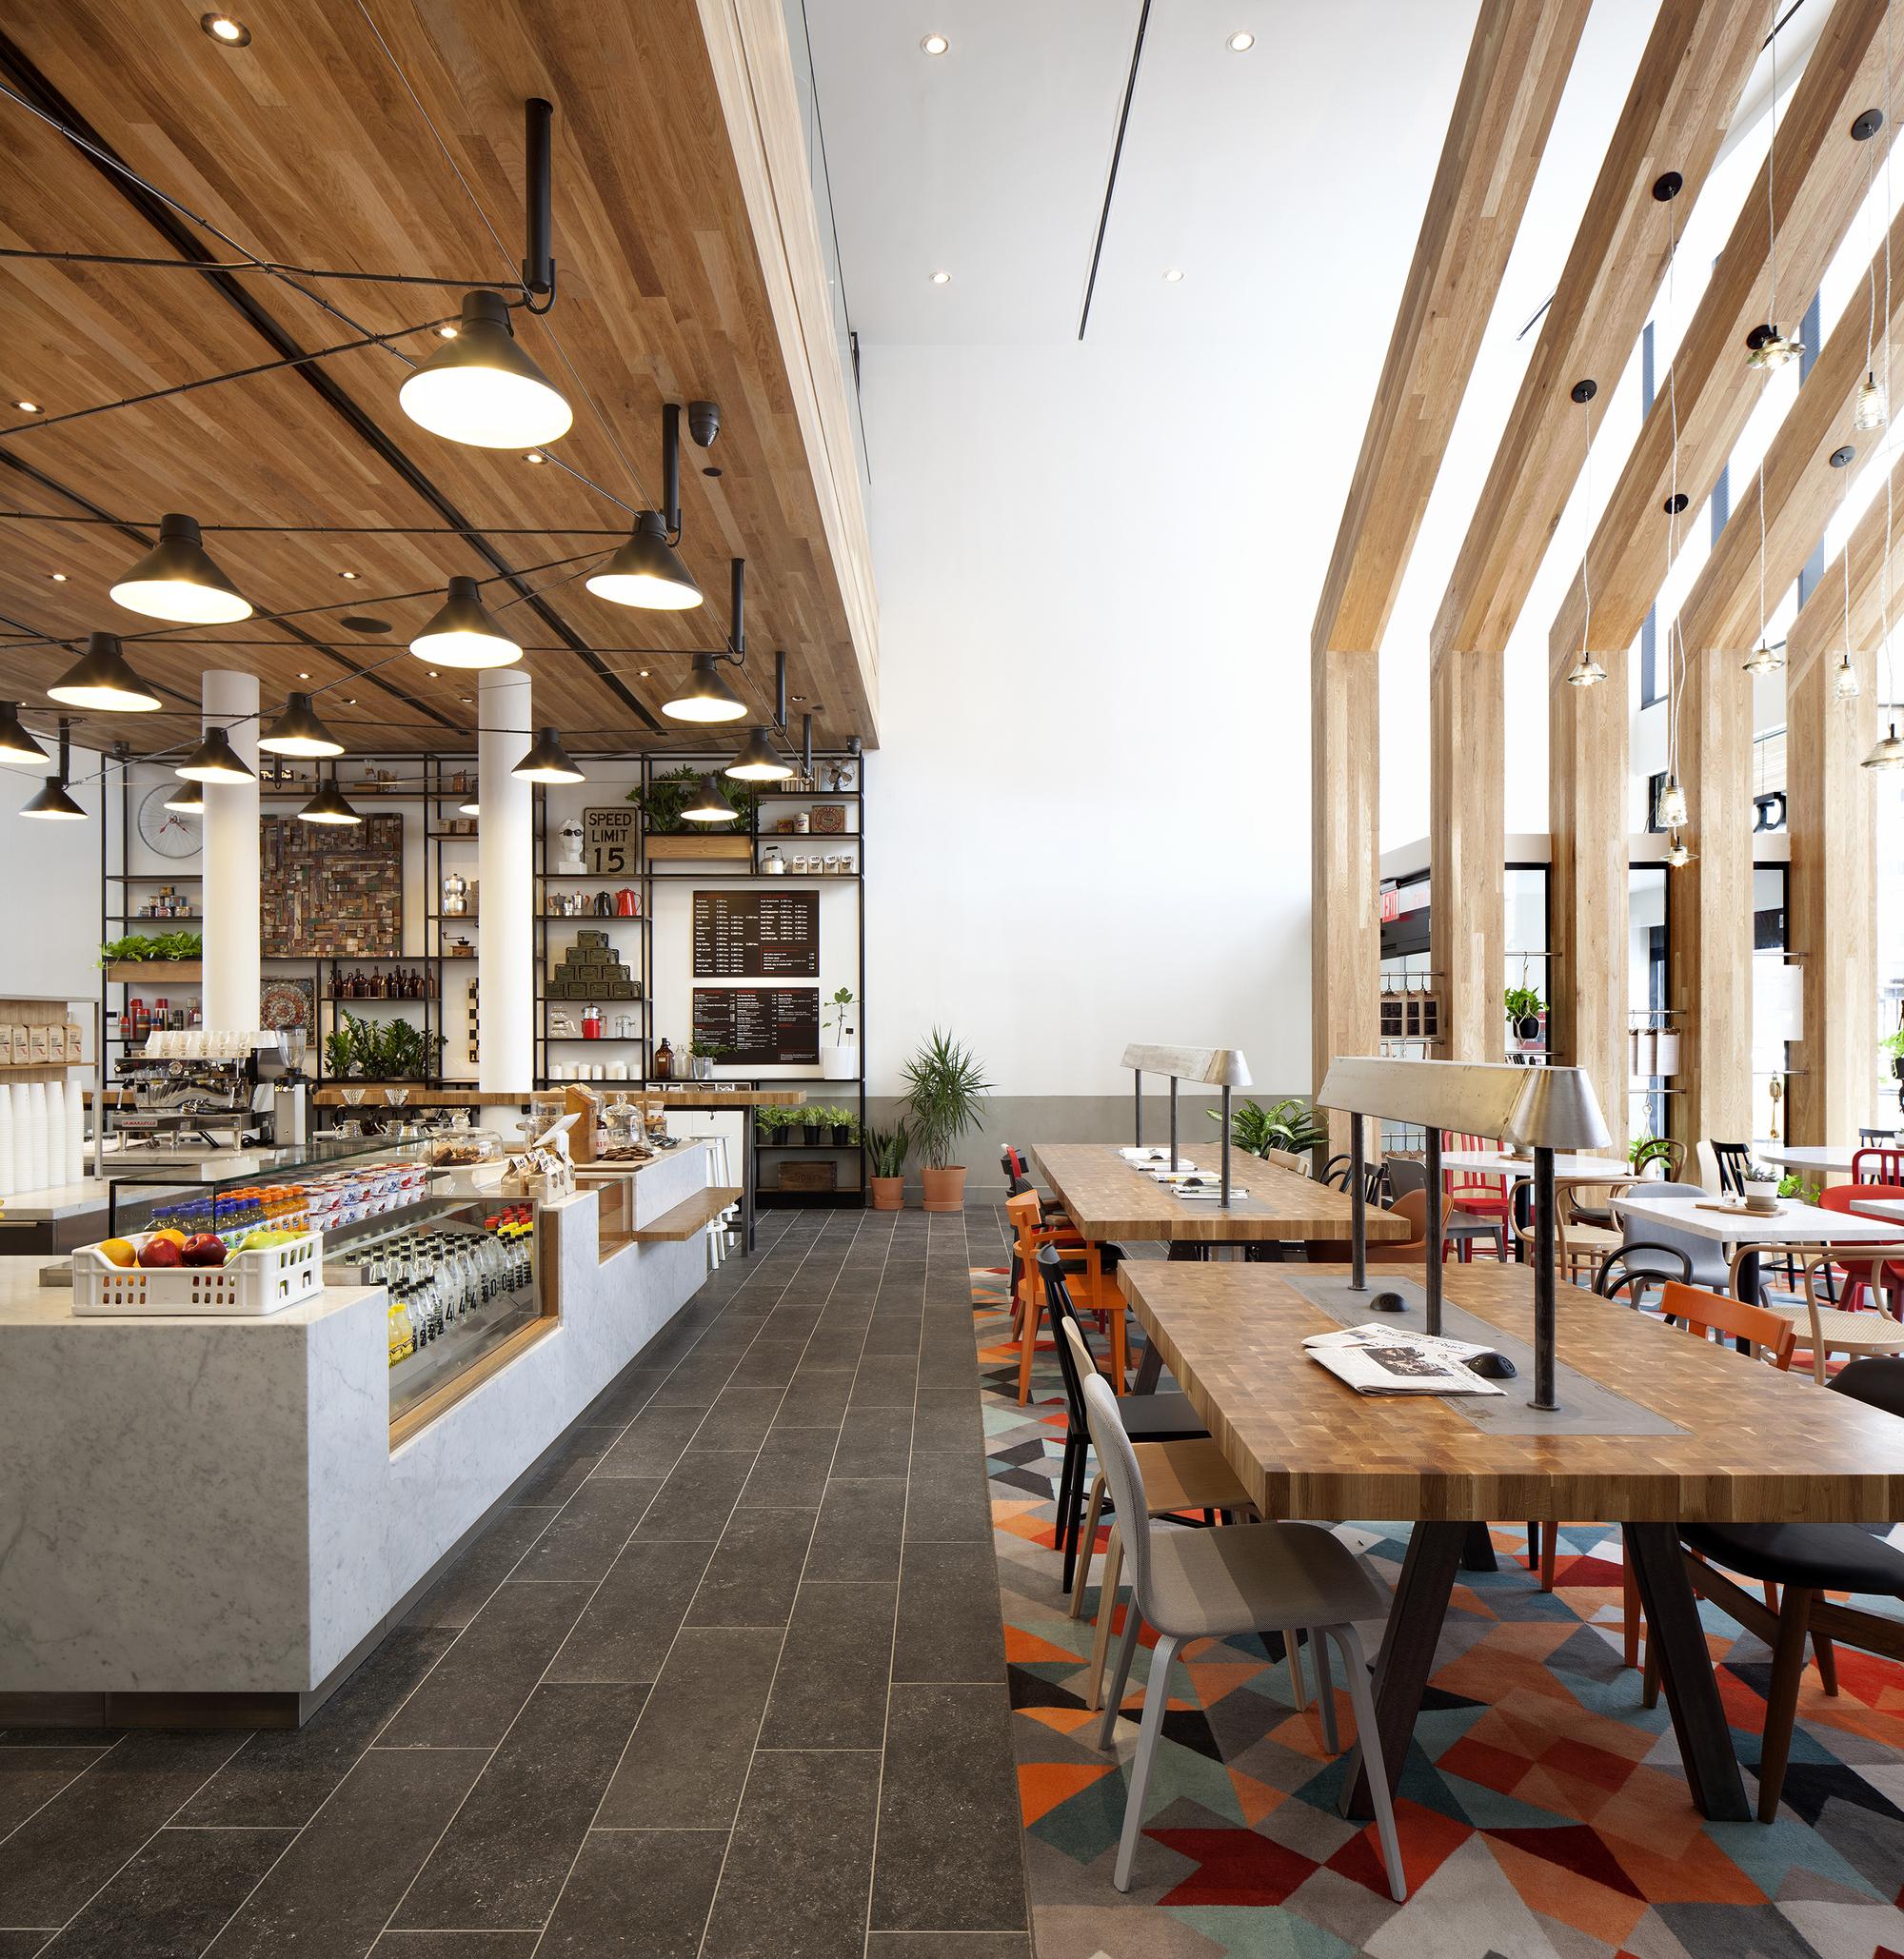 The Coffee Shop Staten Island